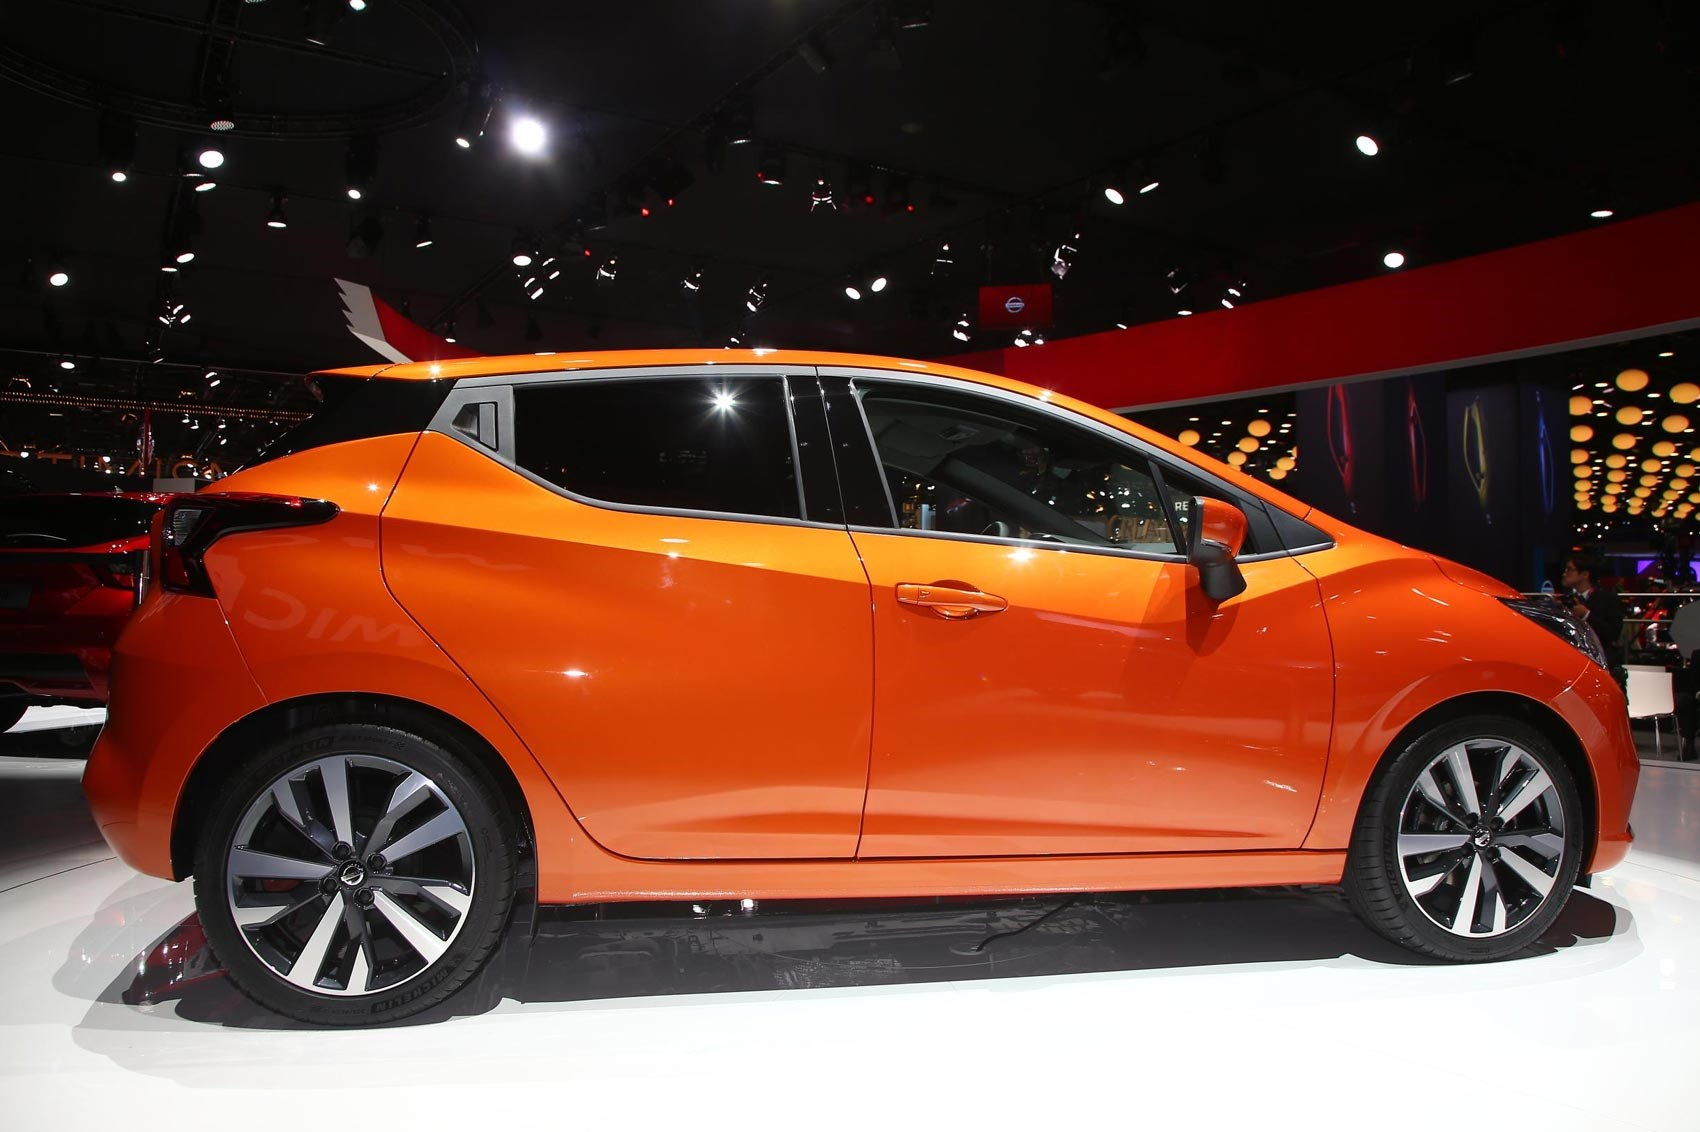 Boring to bold: next-gen 2017 Nissan Micra unveiled | CAR Magazine